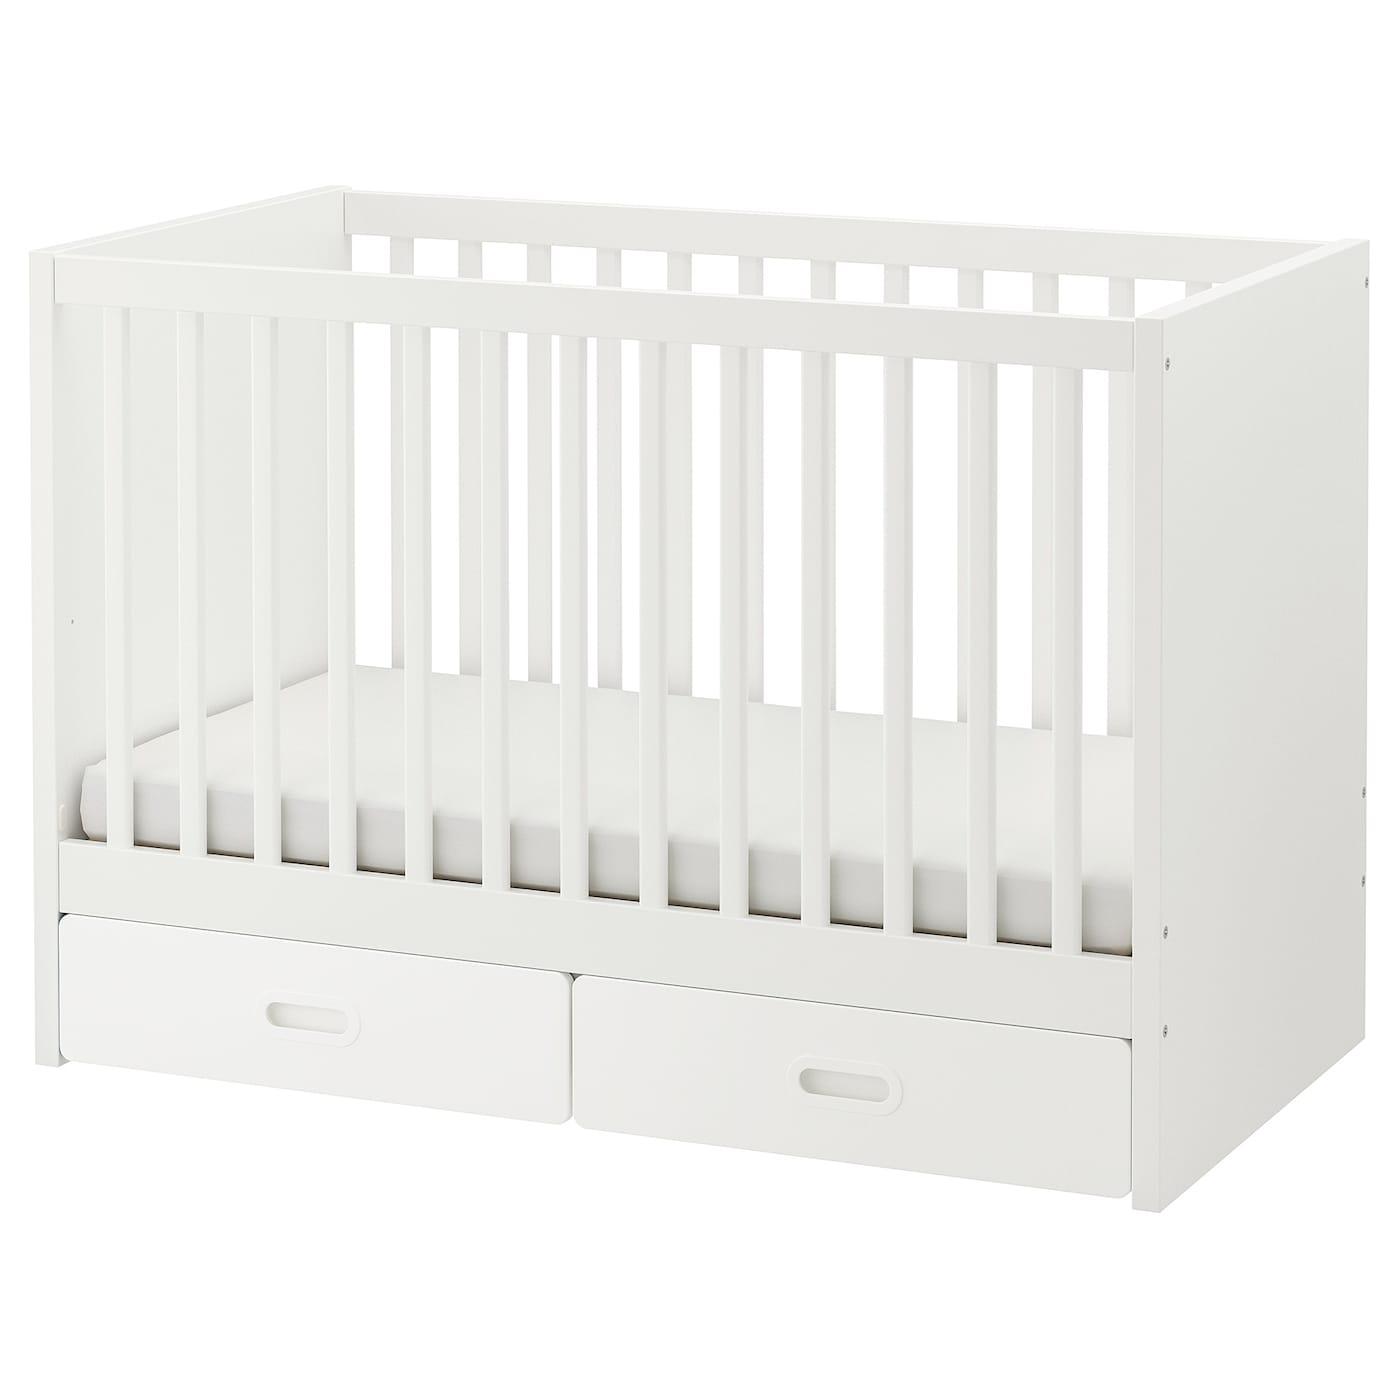 Standaard Afmetingen Babybed.Babybed Ledikant Wieg Ikea